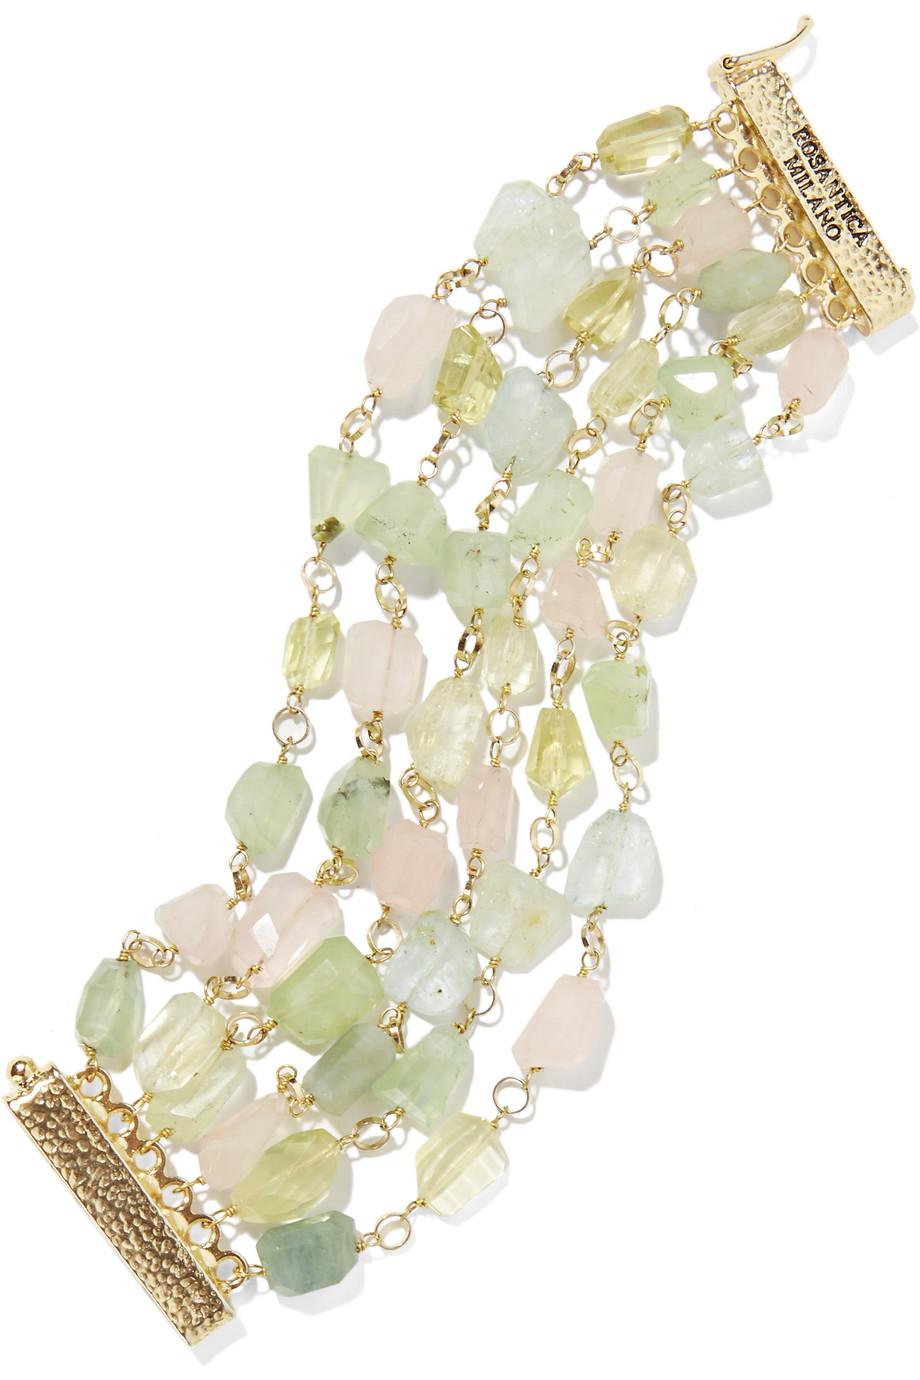 Rosantica Pastelli Gold-Tone Multi-Stone Bracelet, Gold/Mint, Women's